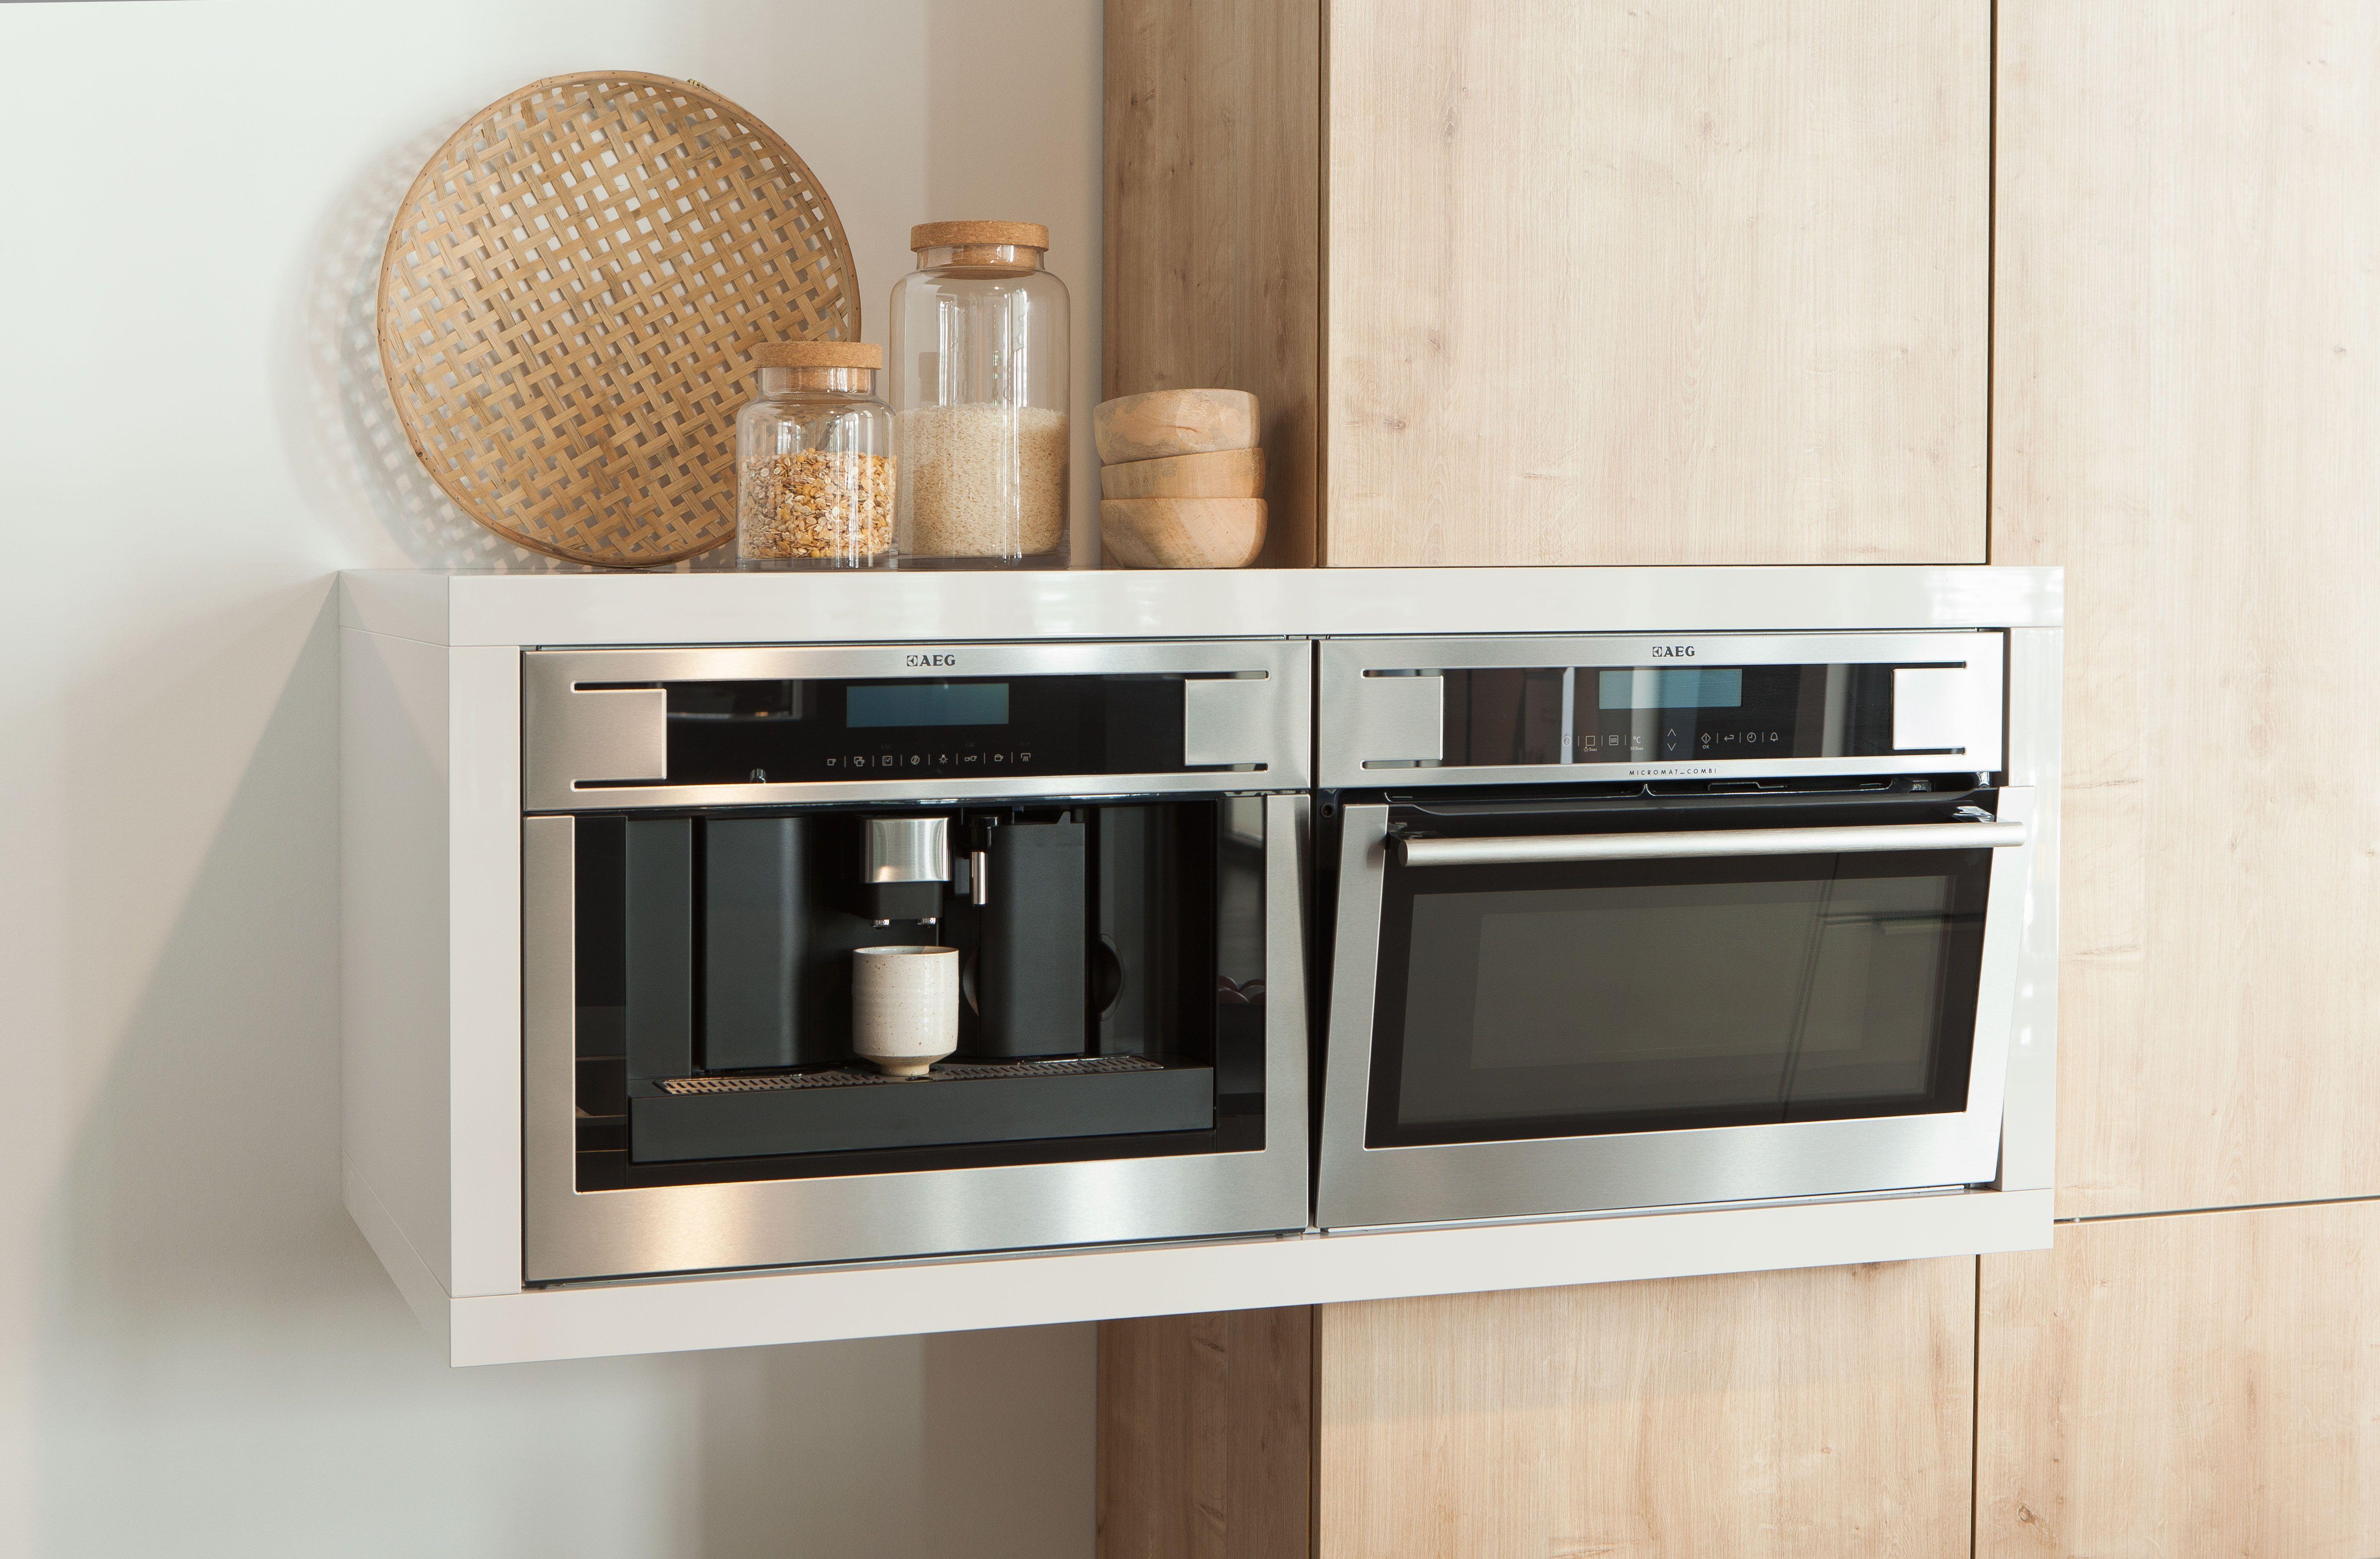 Kastjes Open Keuken : A kleine keuken open kasten keukenwarenhuis